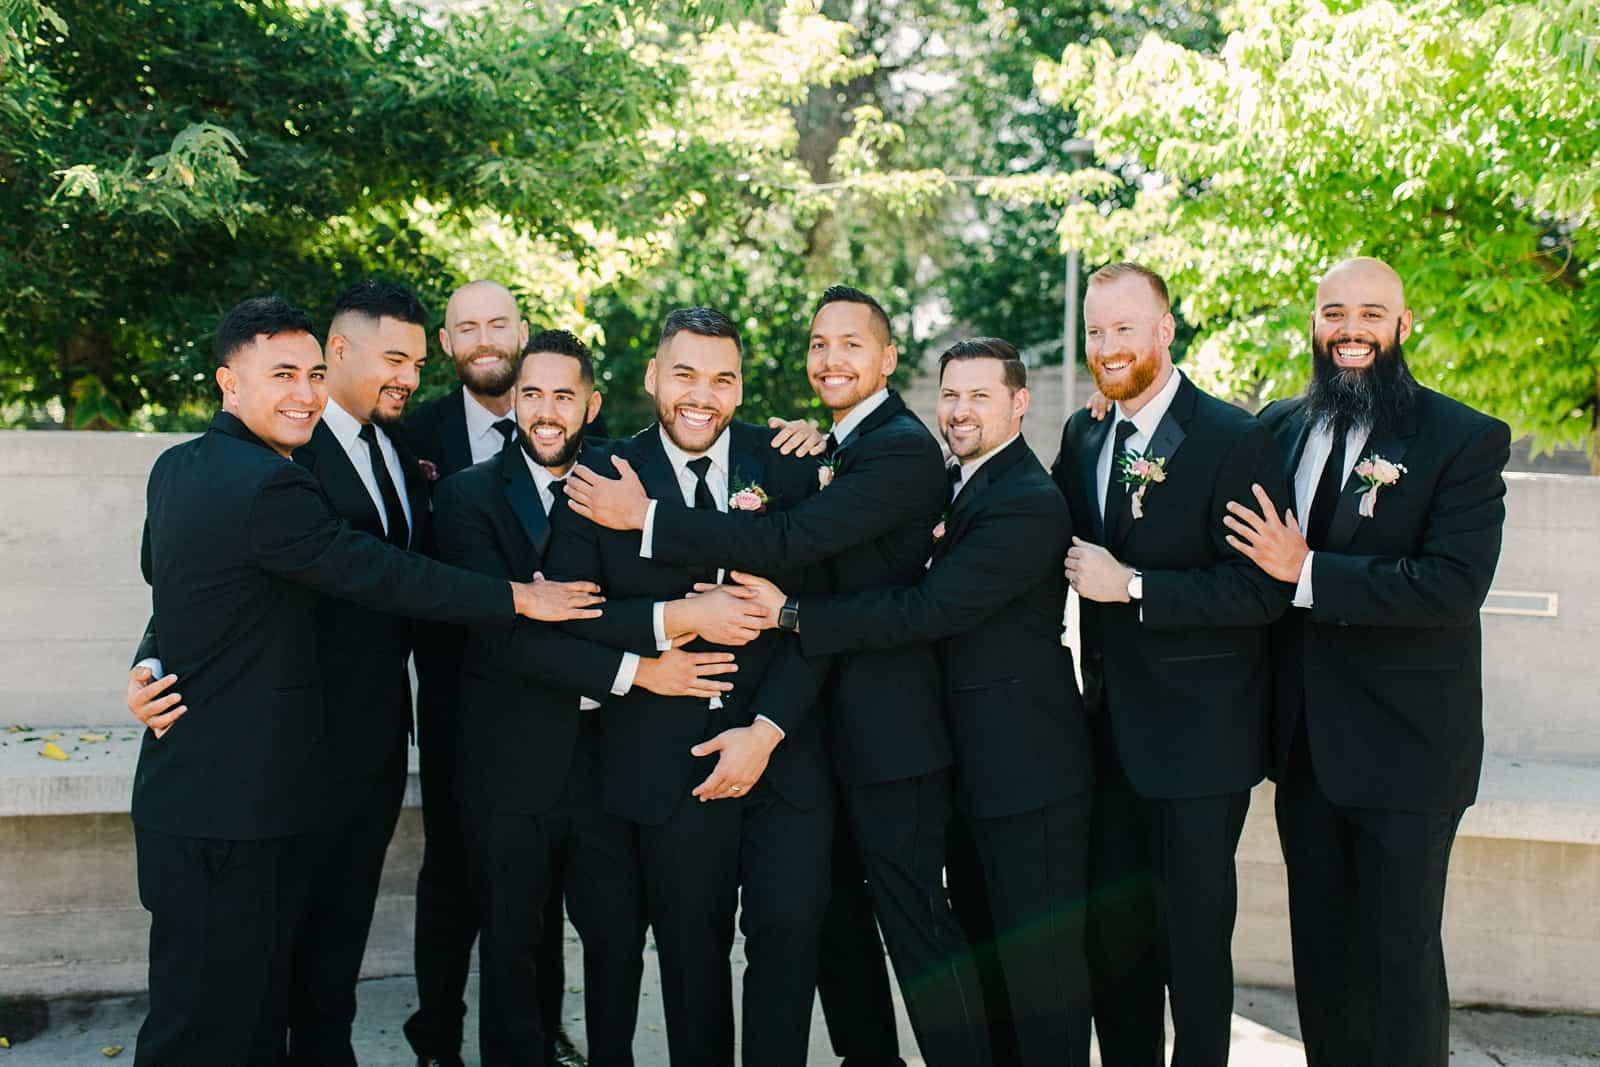 Groom and groomsmen in classic black tuxedos